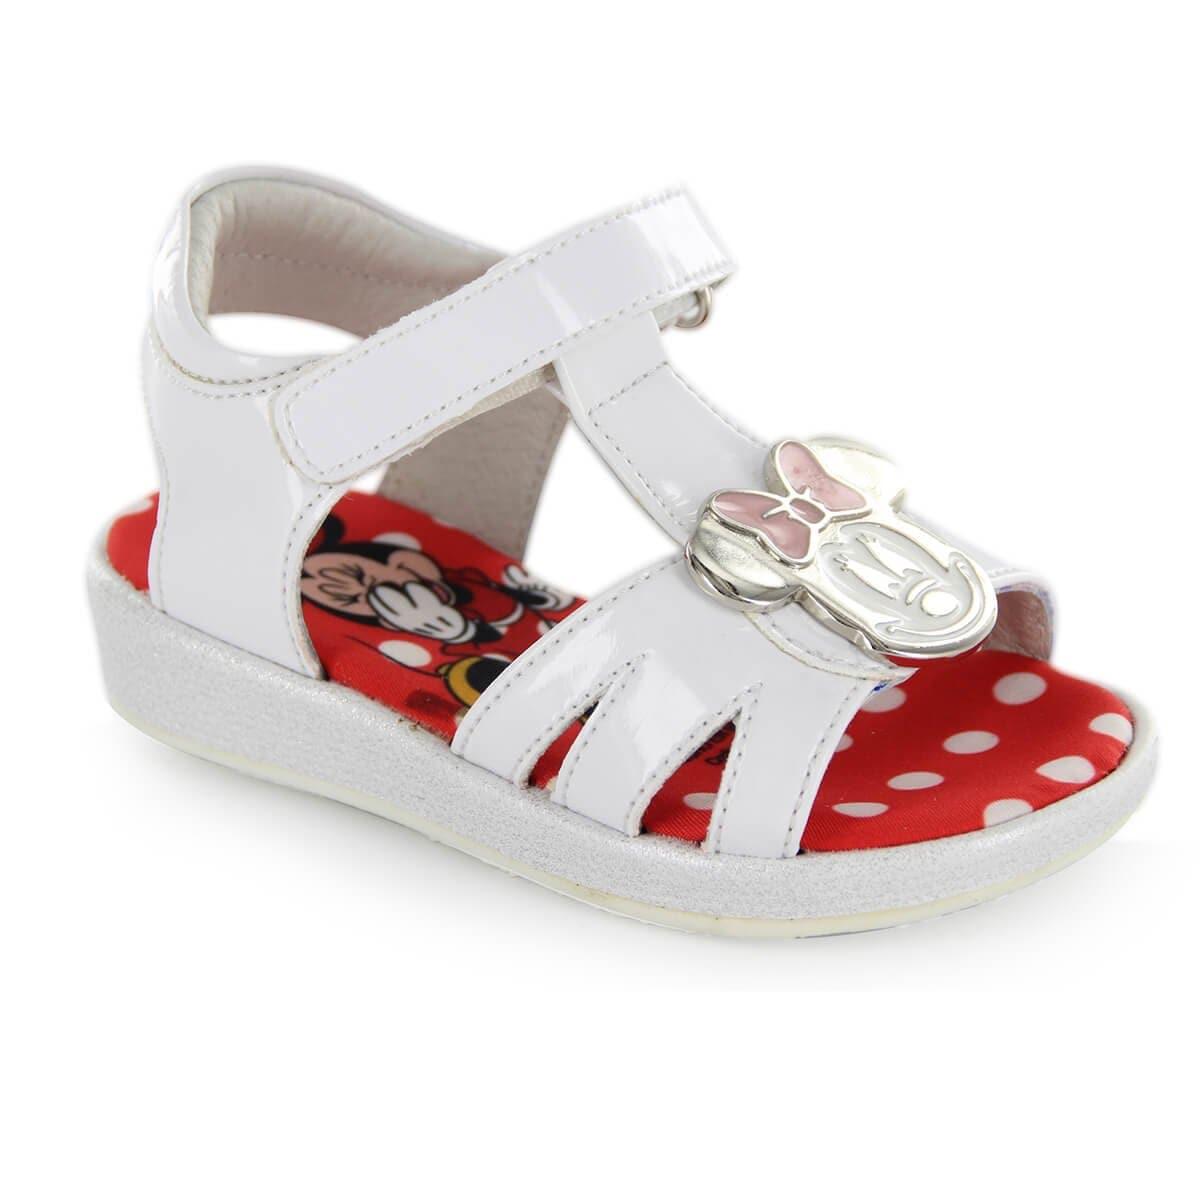 13 Disney Traba T 17 Sandalia Velcro 301000d 5AL34Rjq